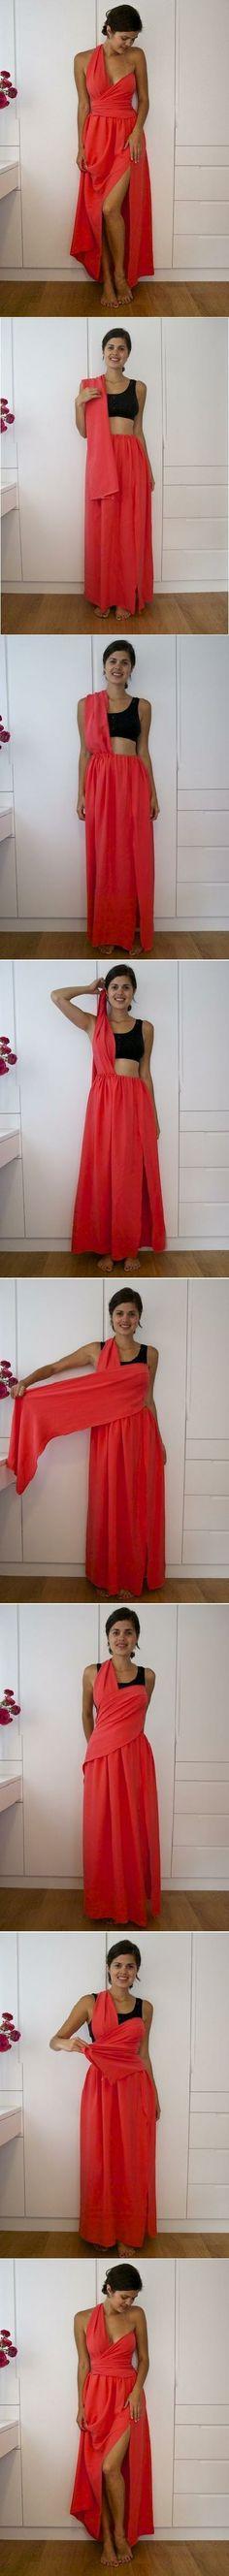 diy, no, sew, dress